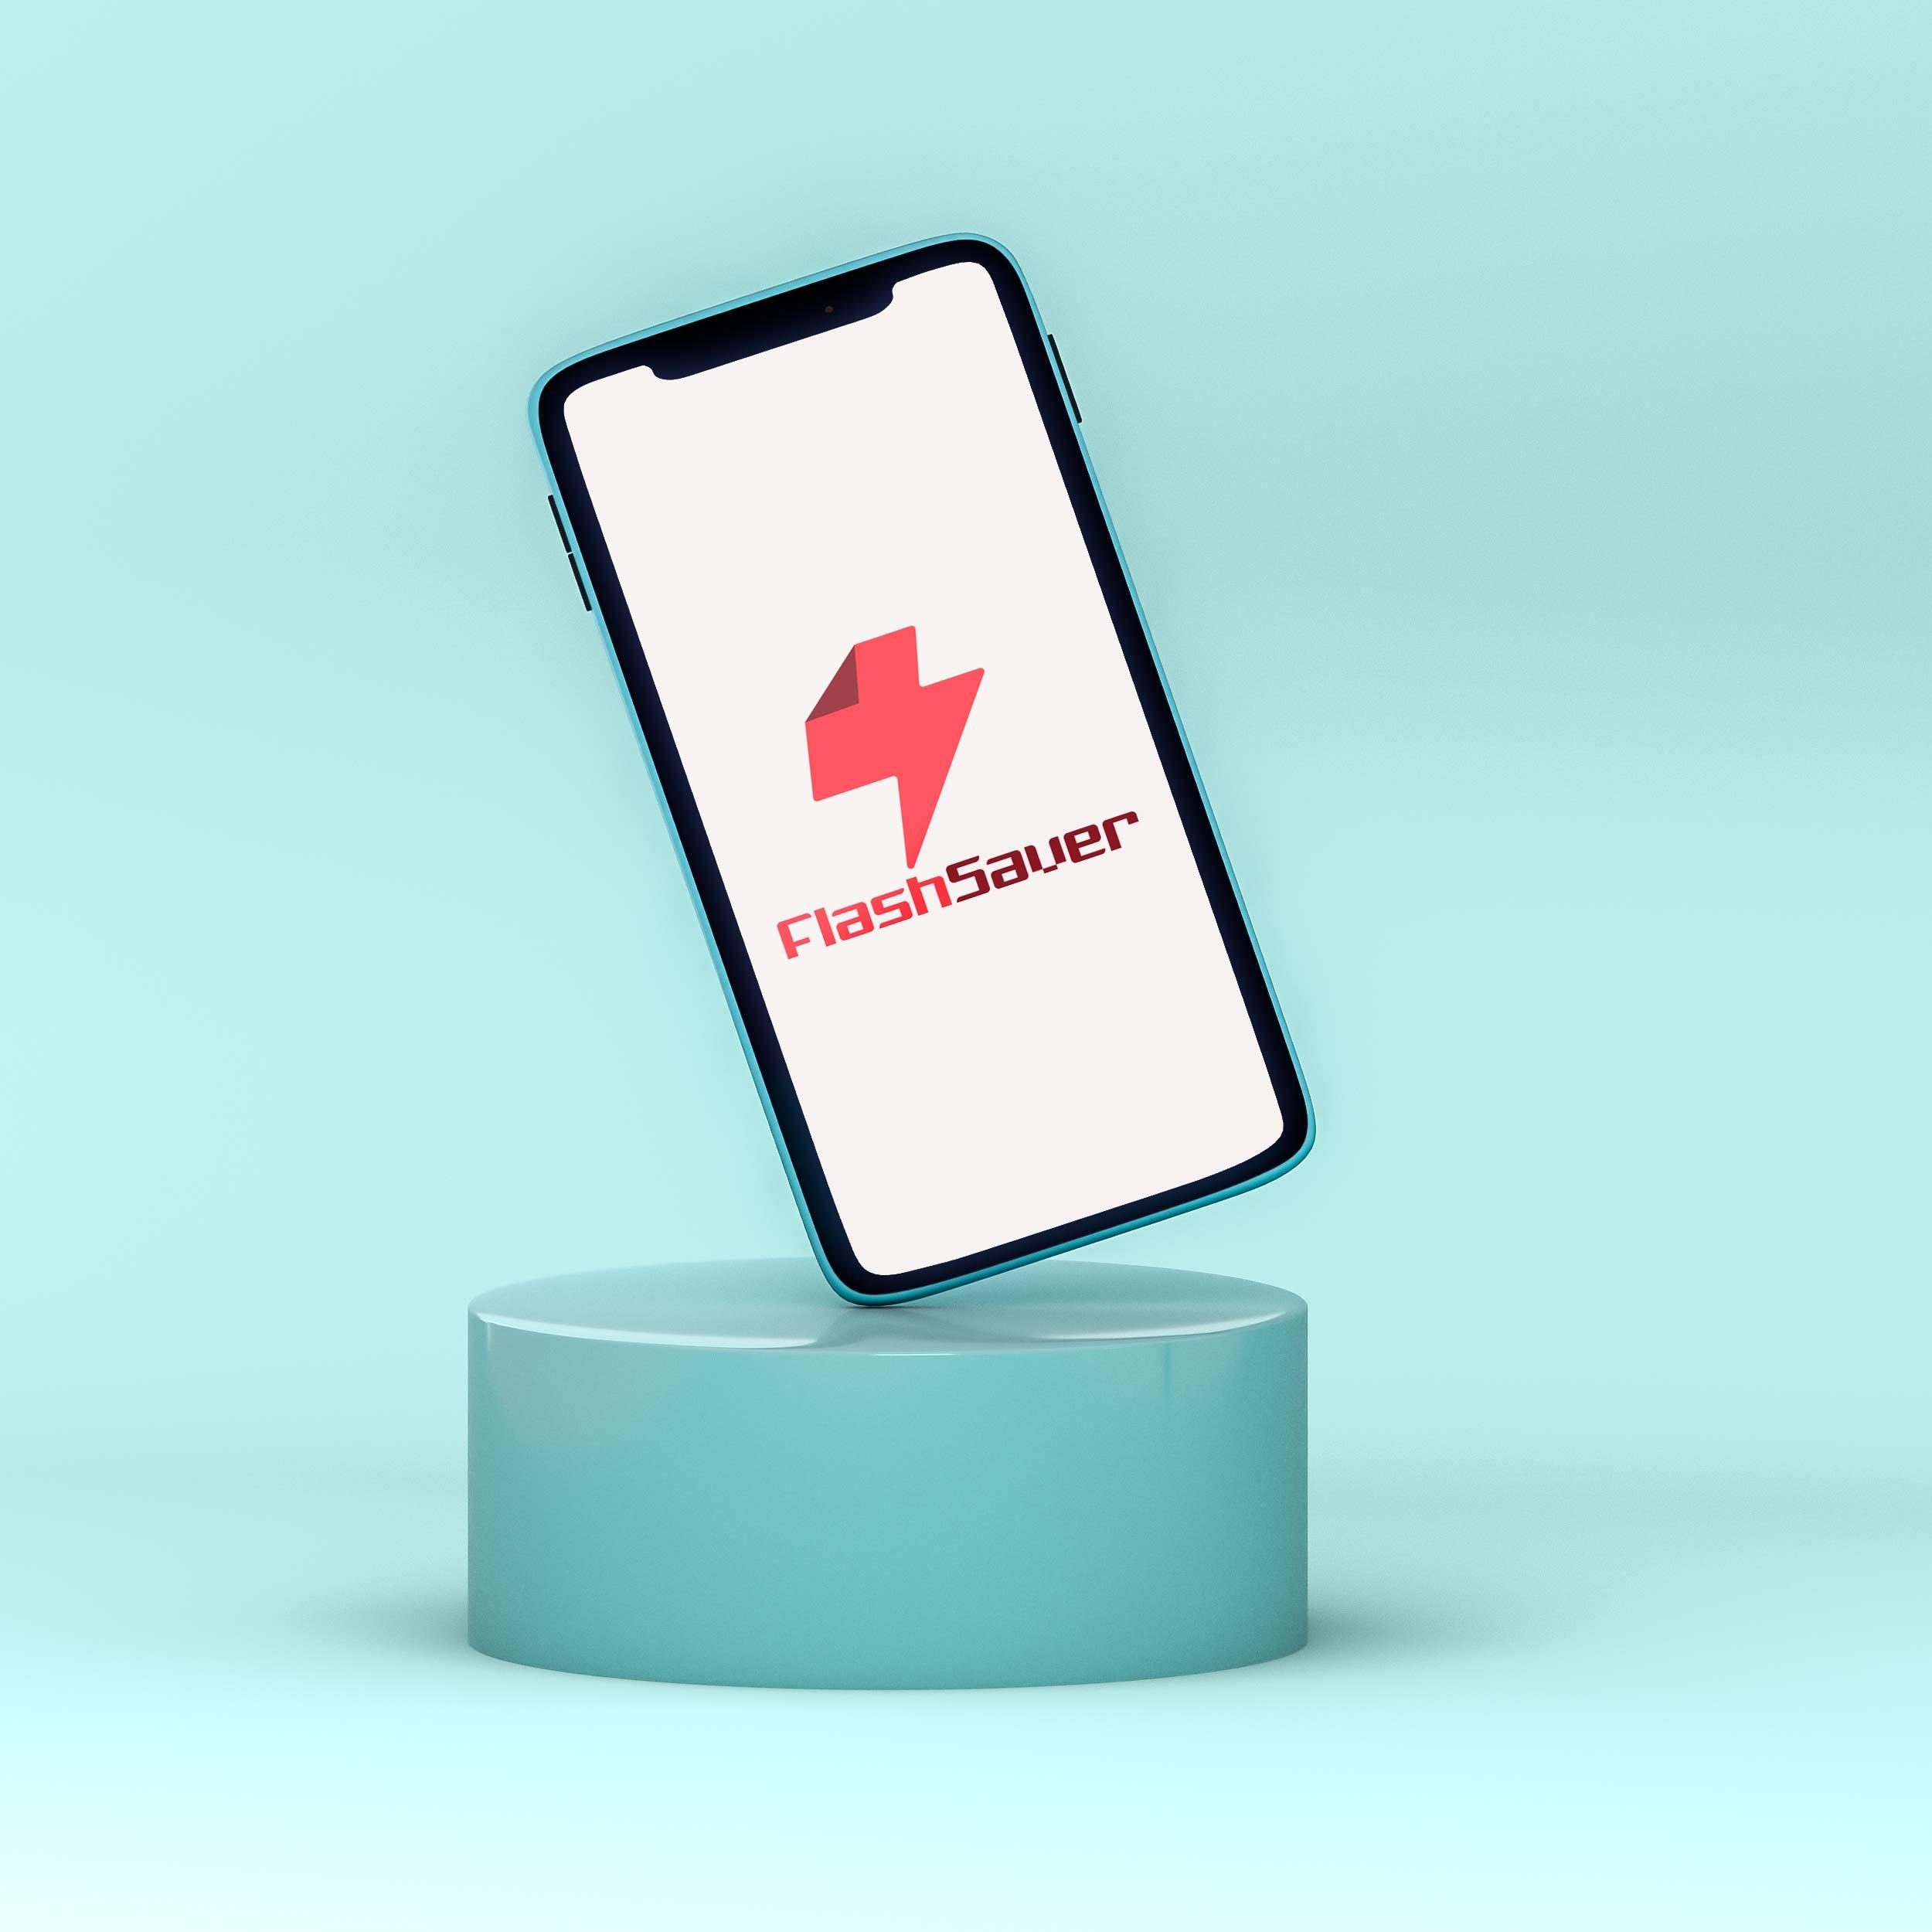 Social media photos and videos download app icon design by Badri Design